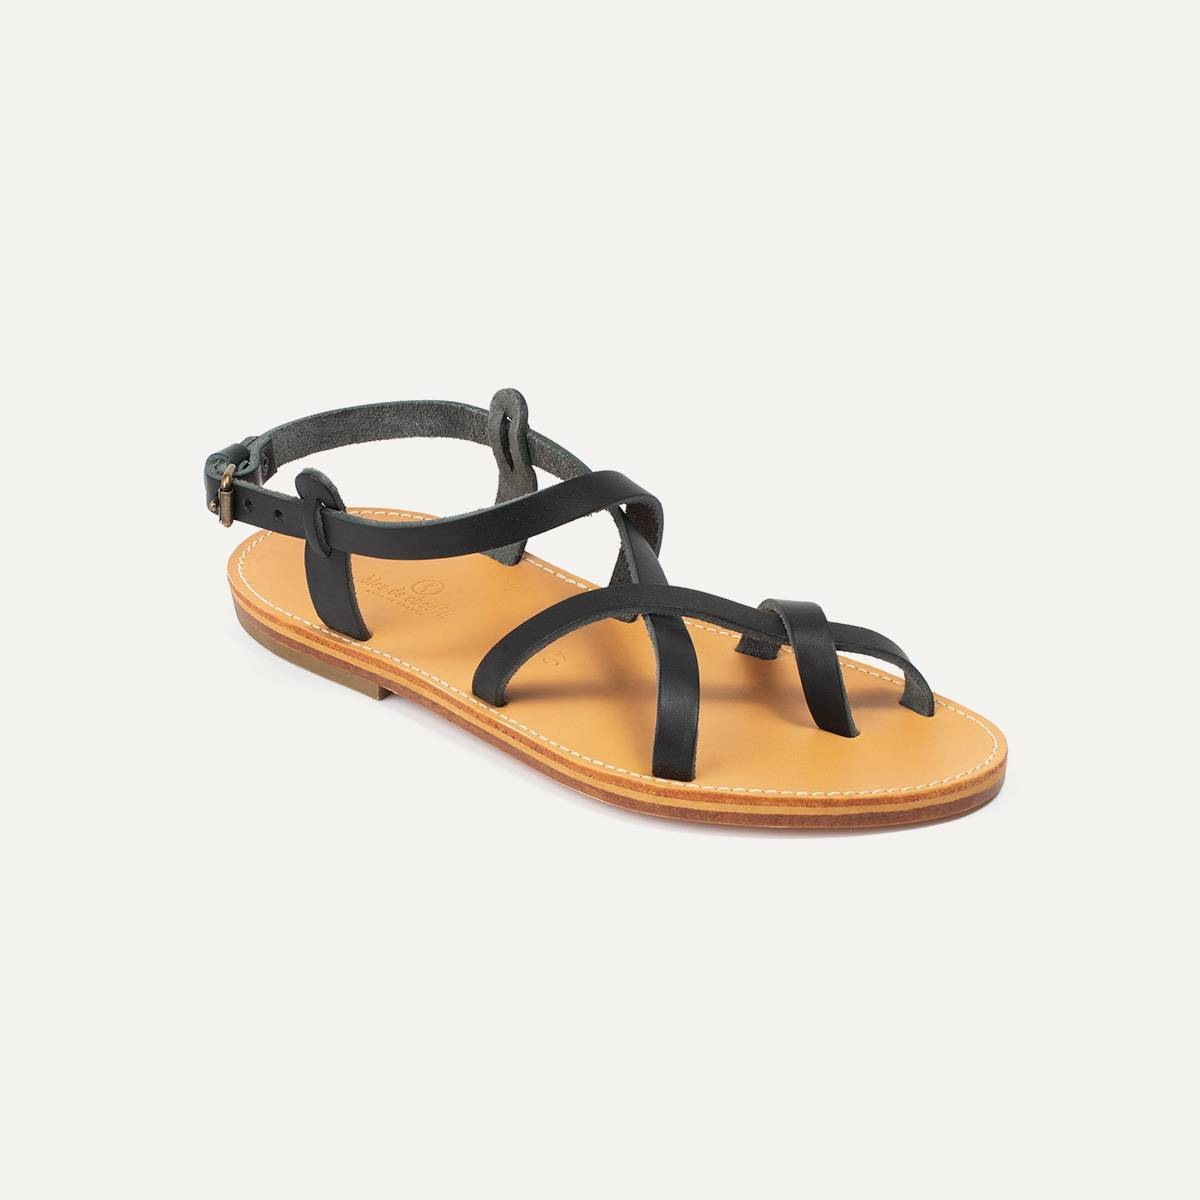 Nara leather sandals - Black (image n°2)